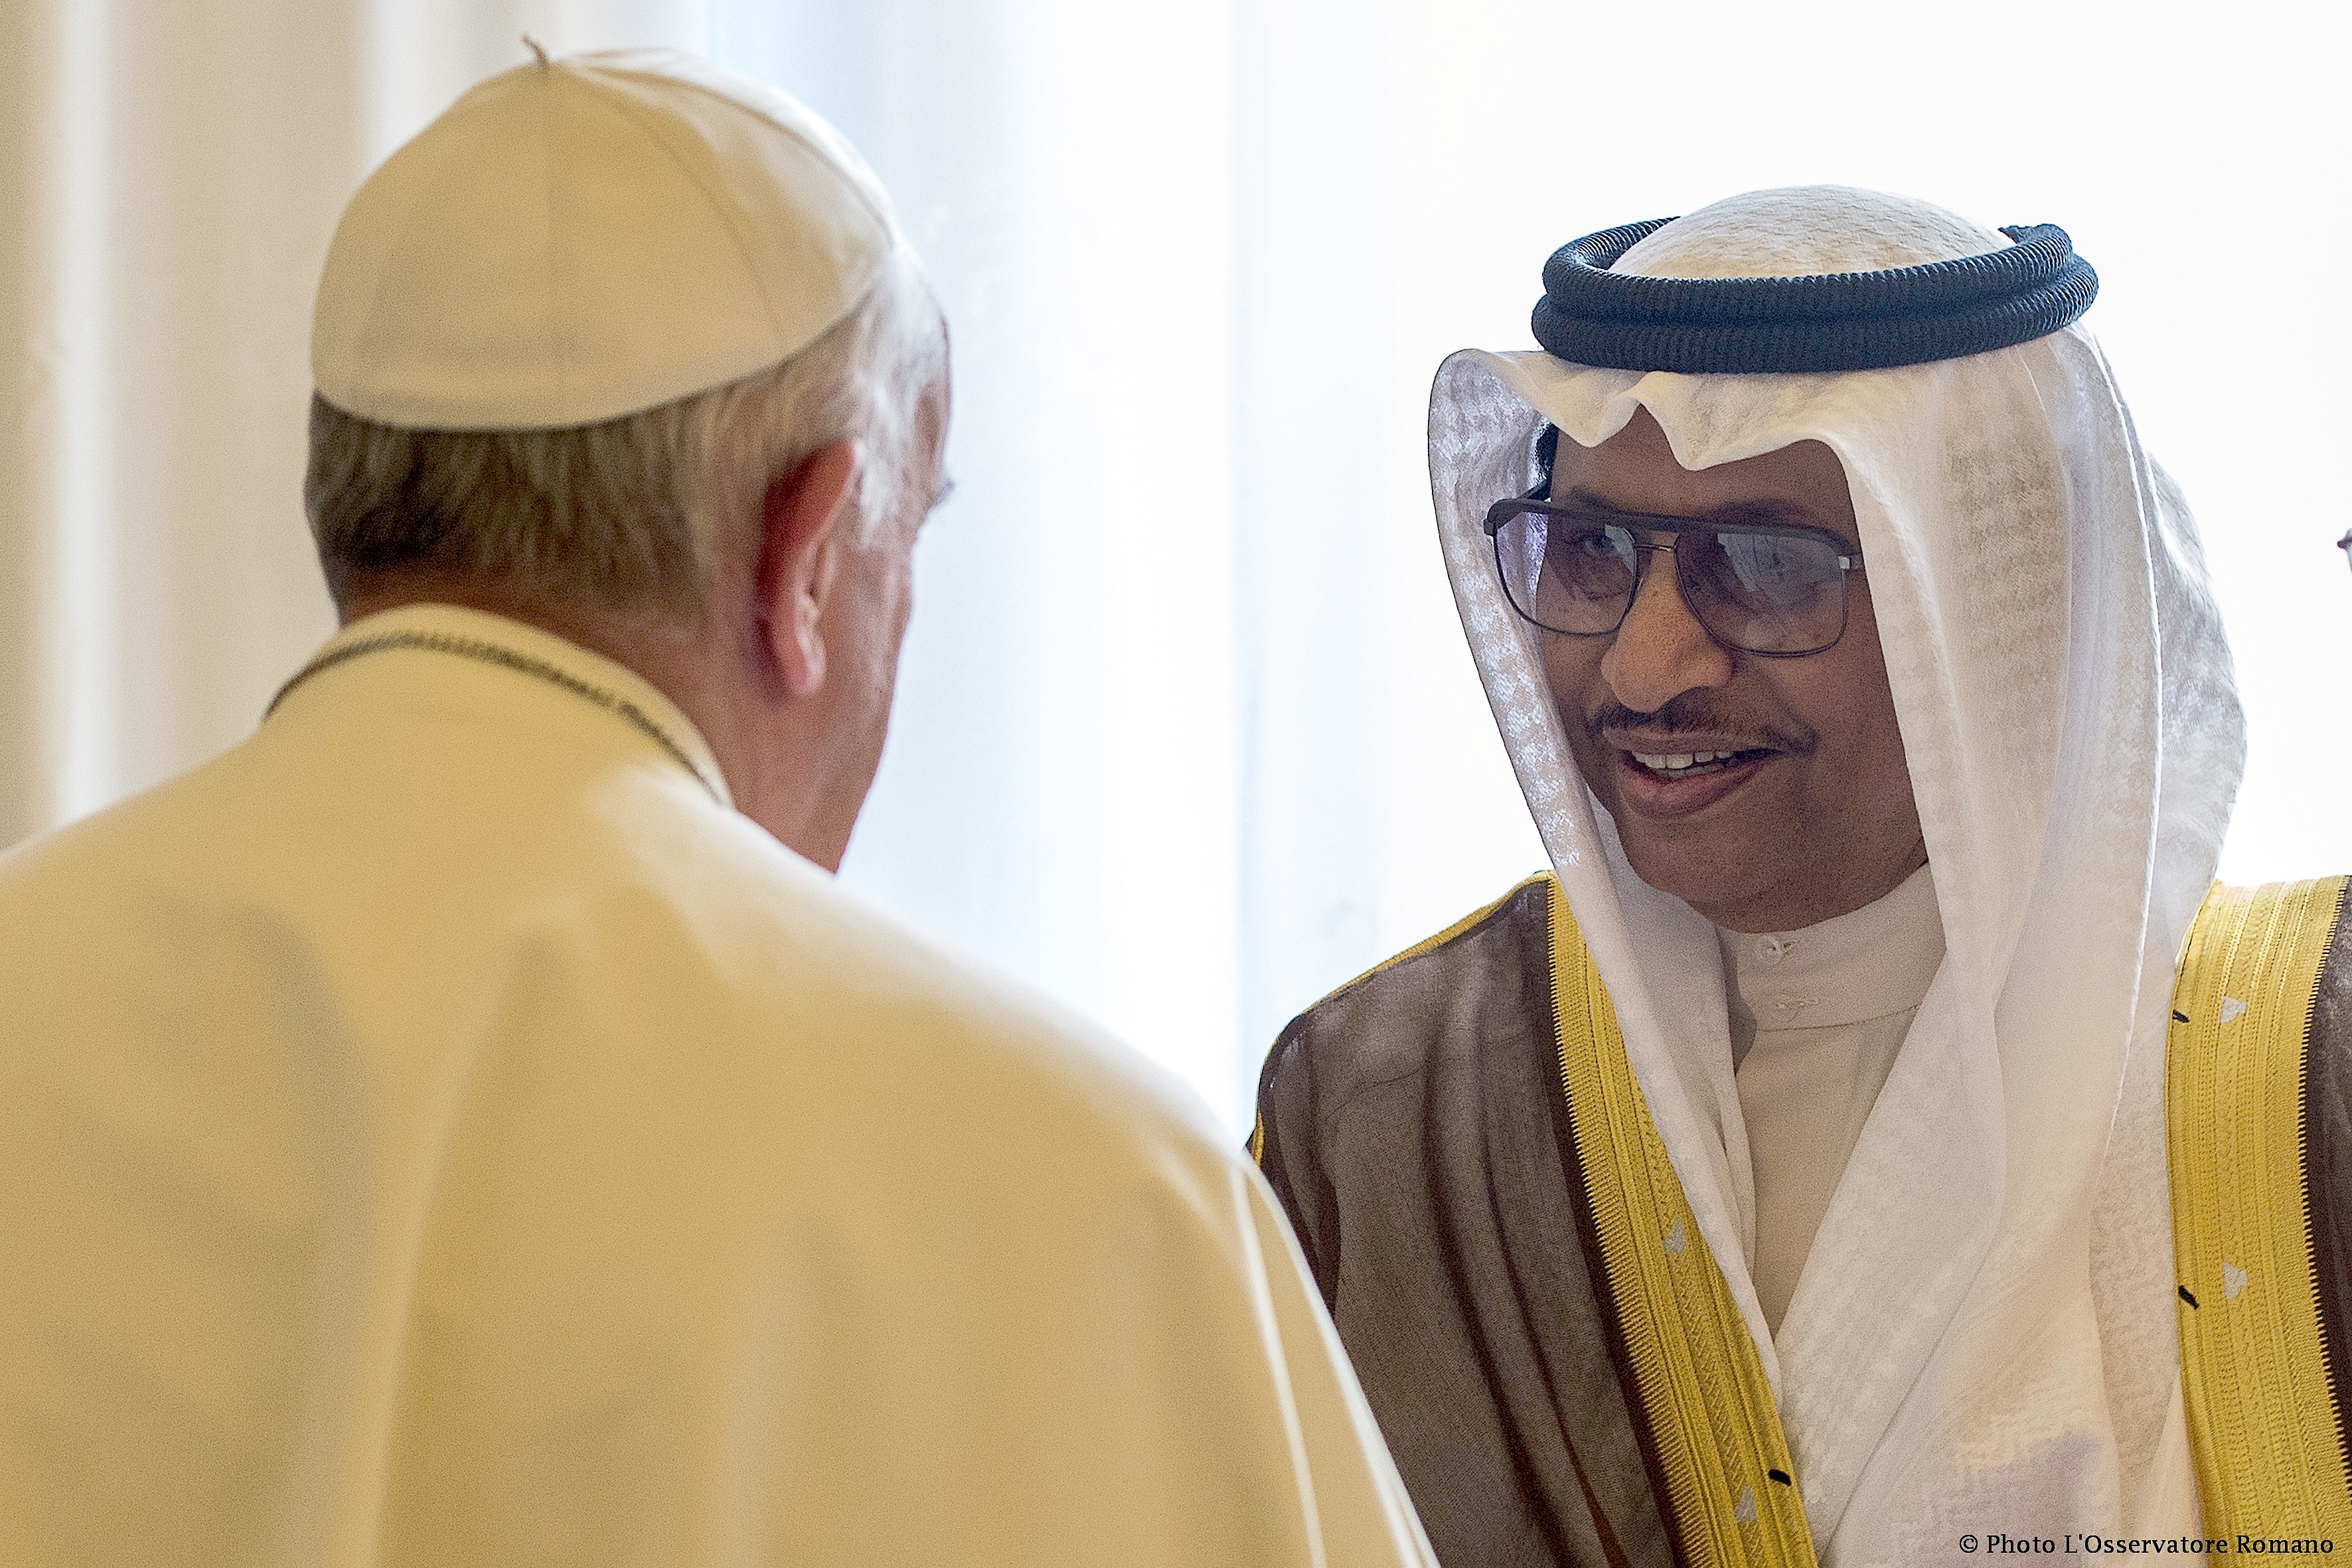 Pope Francis received in audience Sheik Jaber Mubarak Al-Hamad Al-Sabah